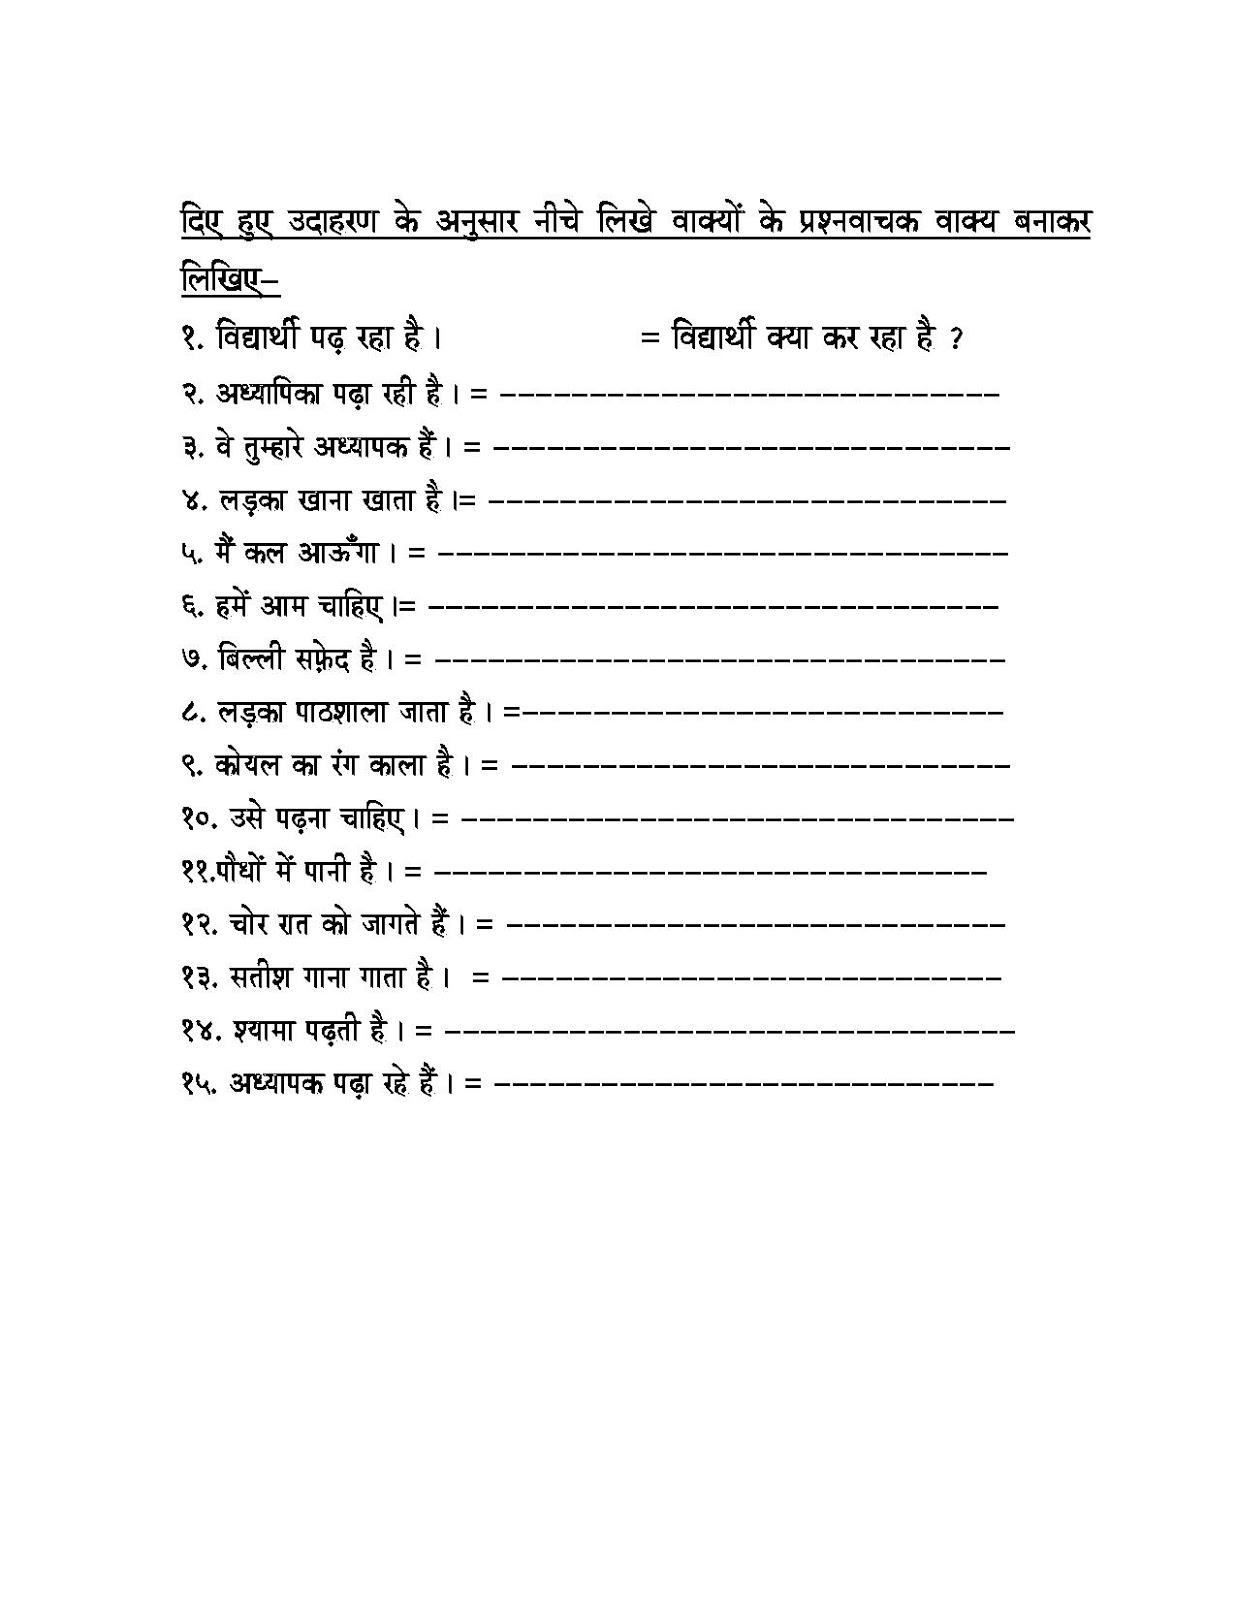 Hindi Grammar Worksheet Class 3   Printable Worksheets and Activities for  Teachers [ 1600 x 1236 Pixel ]